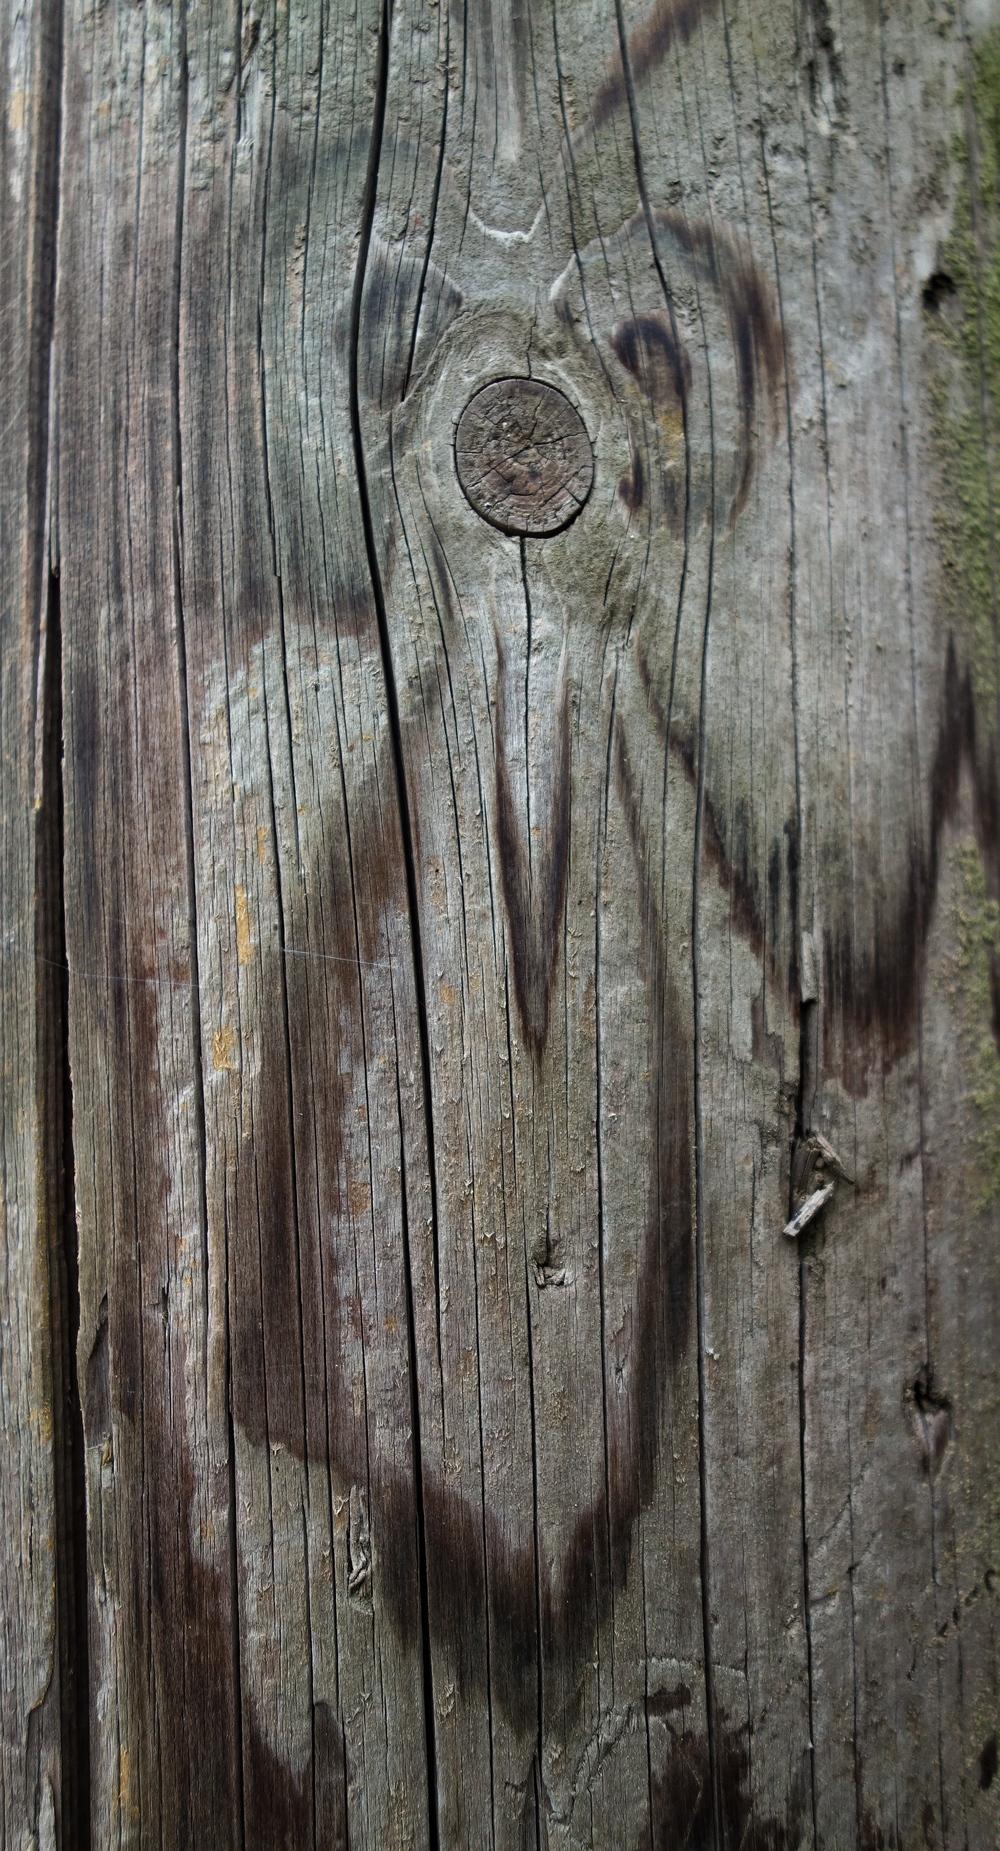 Telegraph pole Meerkat